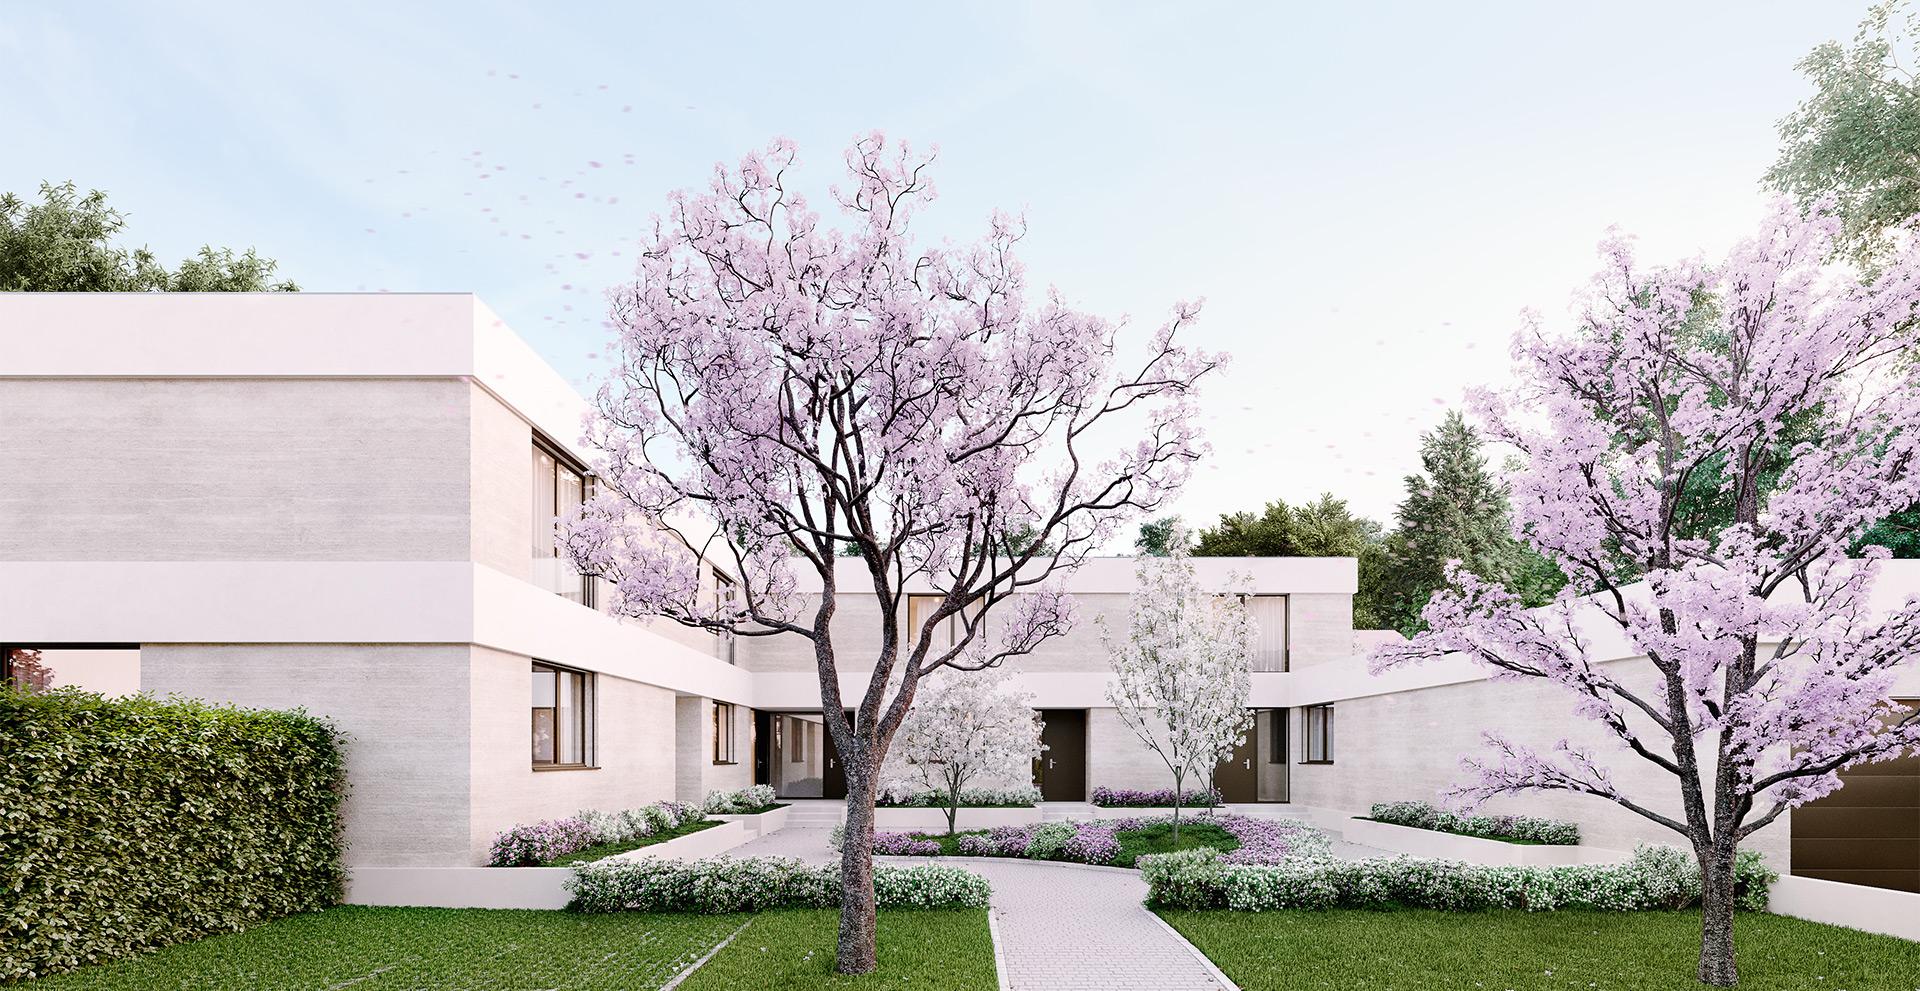 la-residence-vesenaz_header